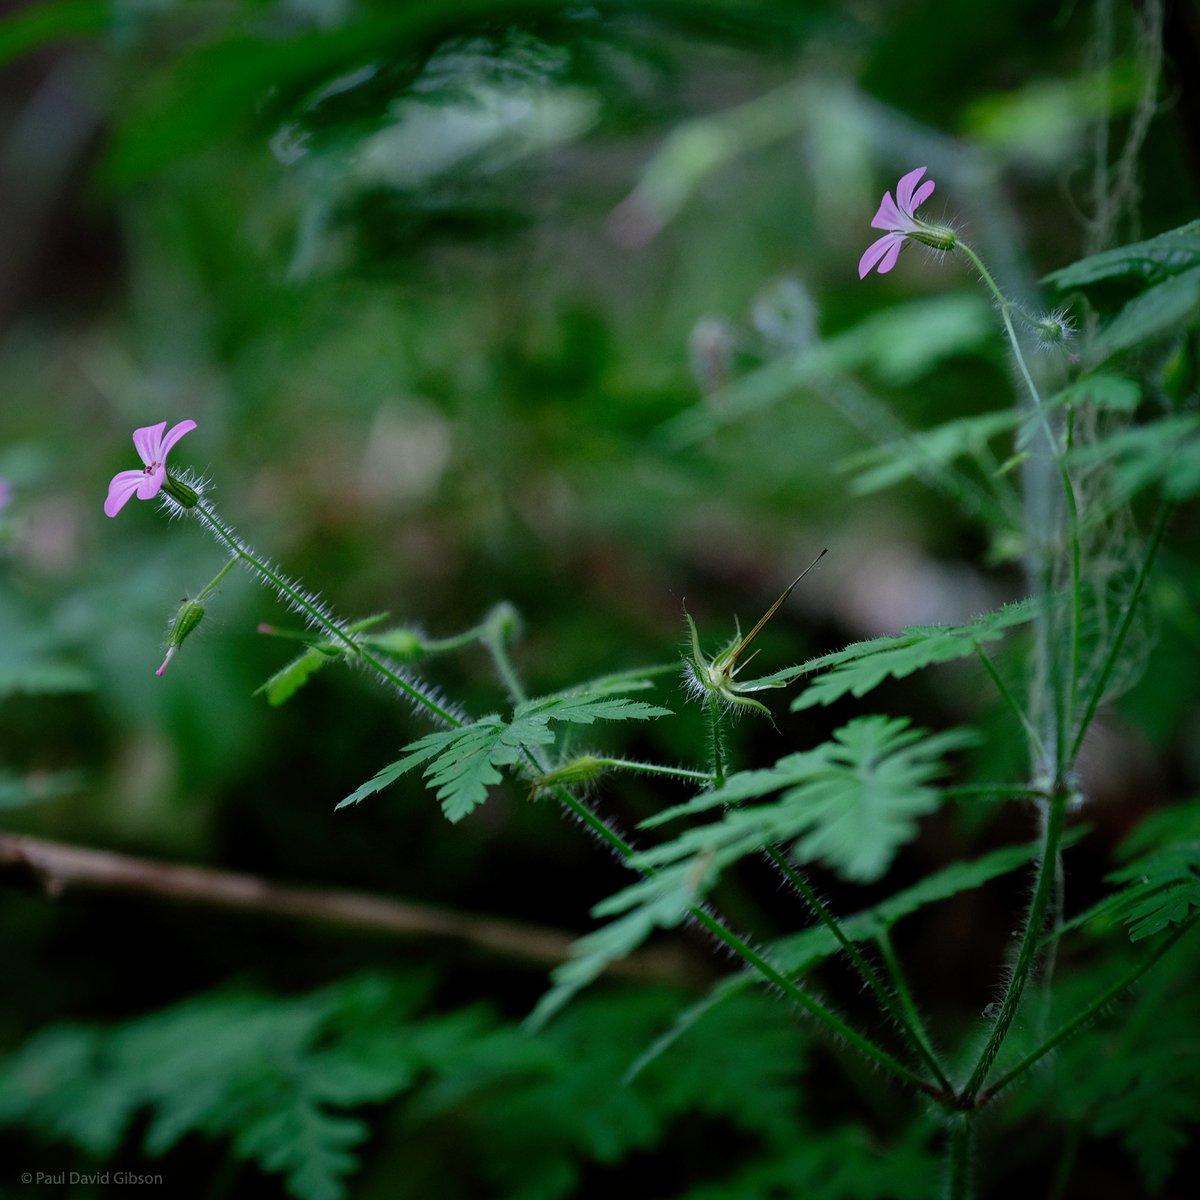 Nature Walk | Federation Forest State Park, WA | July 2020  #nature #coloursofnature #naturelove #natureswonder #washington #pacificnorthwest #pnw #pnwlife #fujifilm #fujixseries #fujixt2 #fuji1655 #fujilove #myfujilovepic.twitter.com/xl4wG698rC